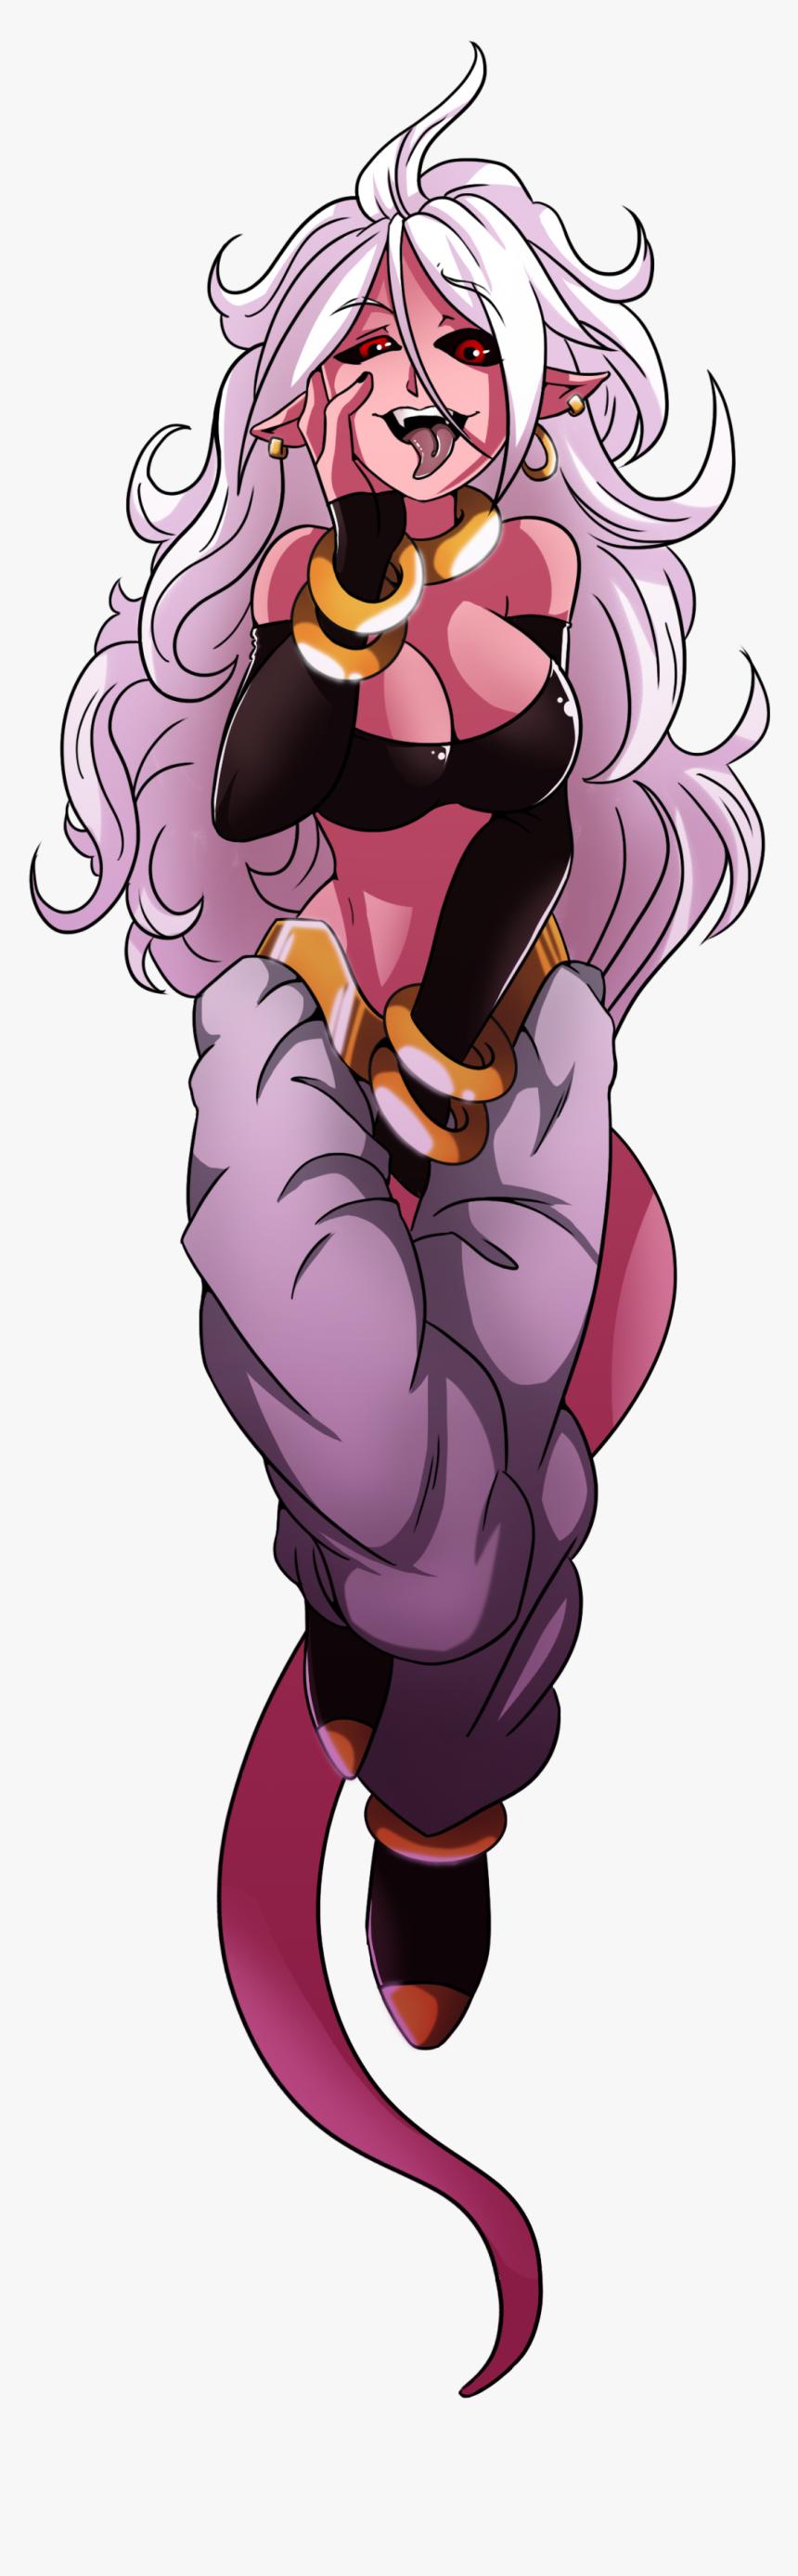 Sexy android 21 Dragon Ball: